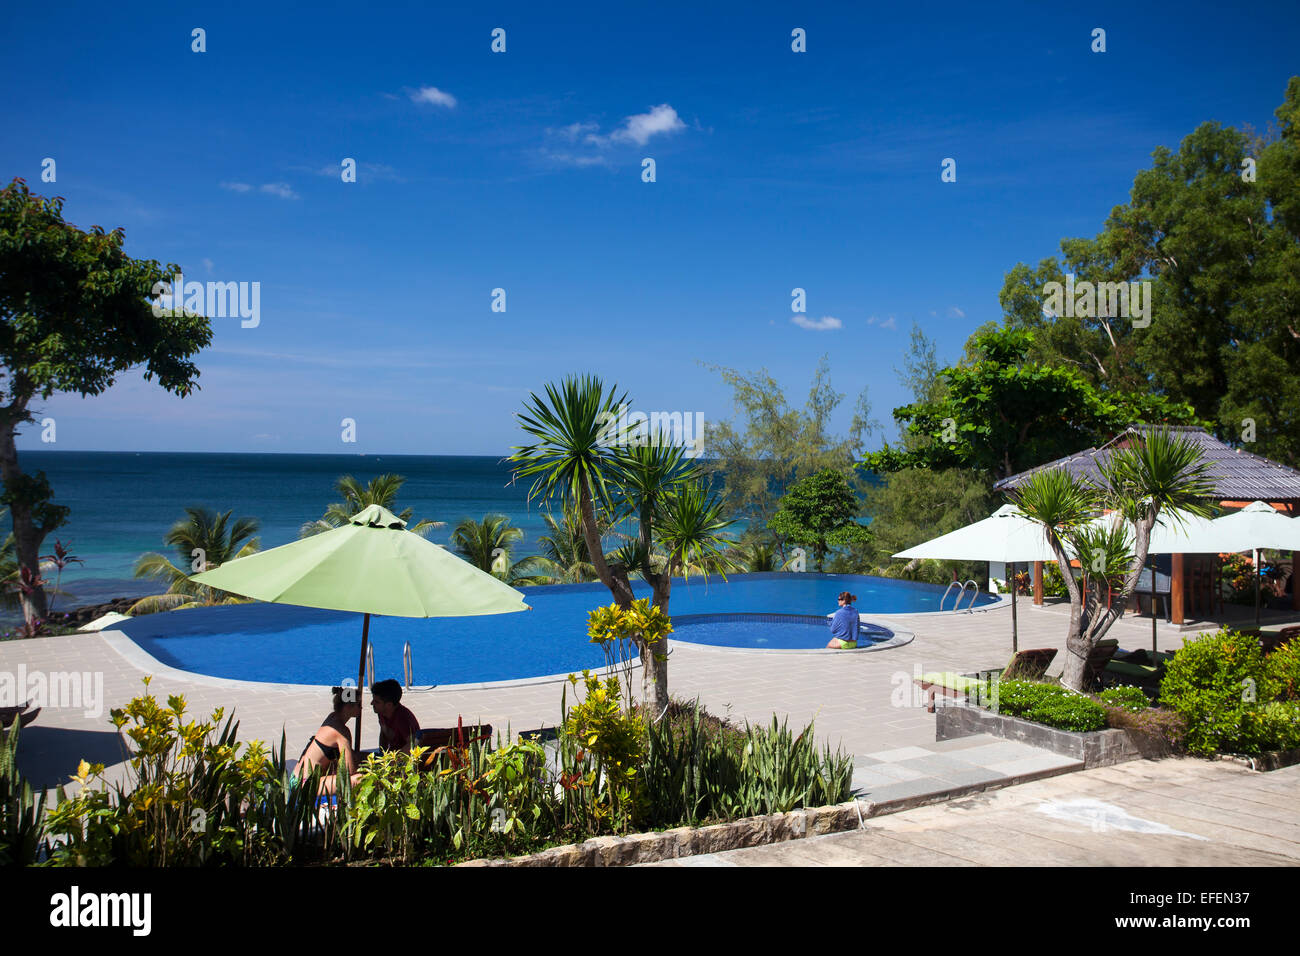 Resort with swimming pool in Eco Lodge Resort, Phu Quoc Icland, Vietnam - Stock Image